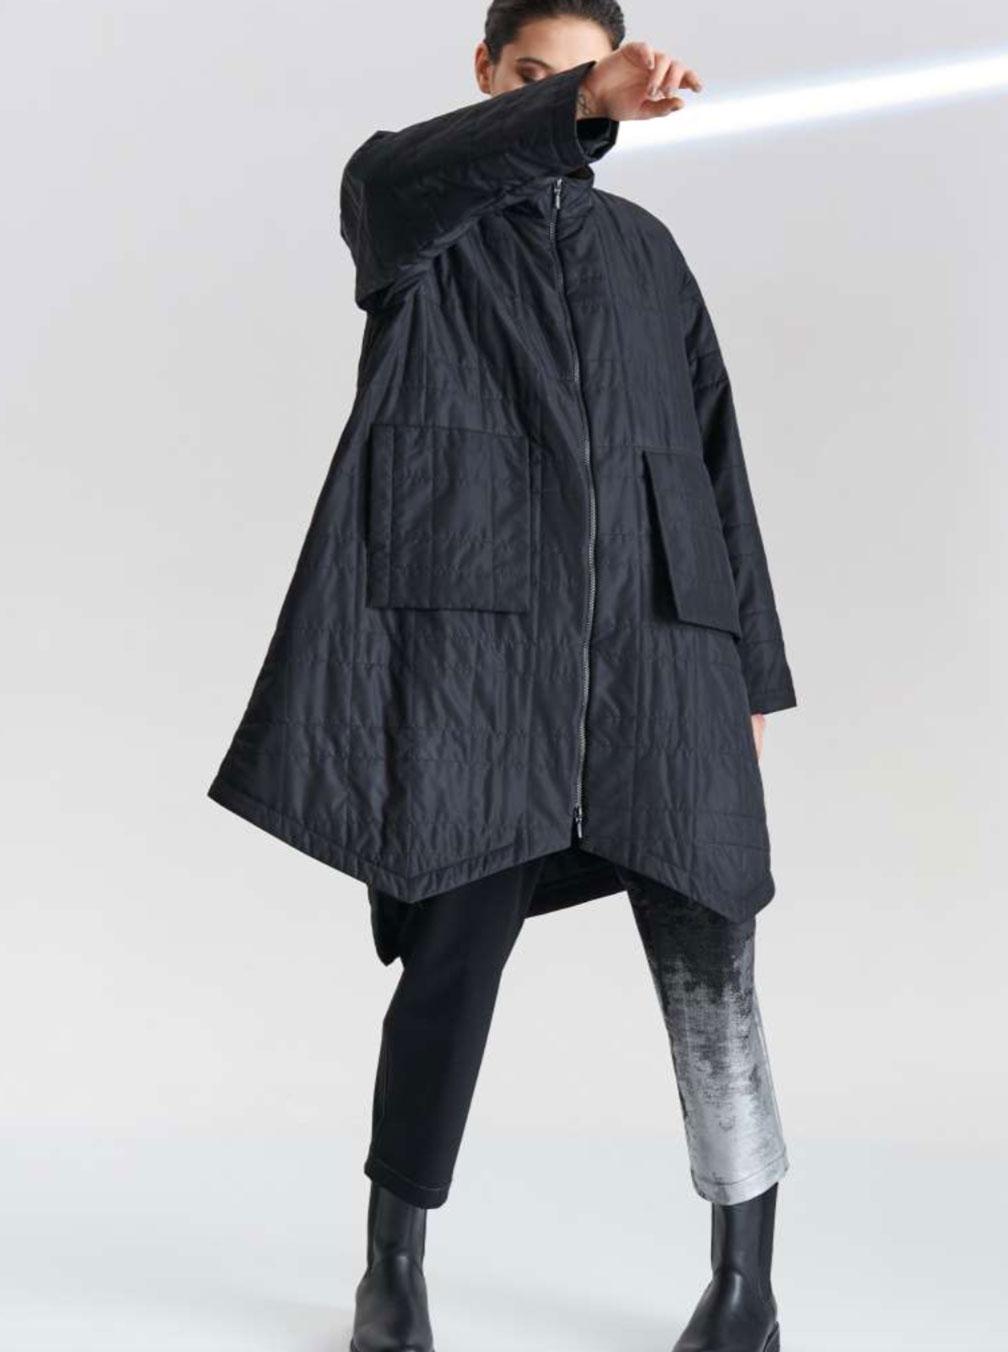 Kedziorek-giacca-nera-donna-3